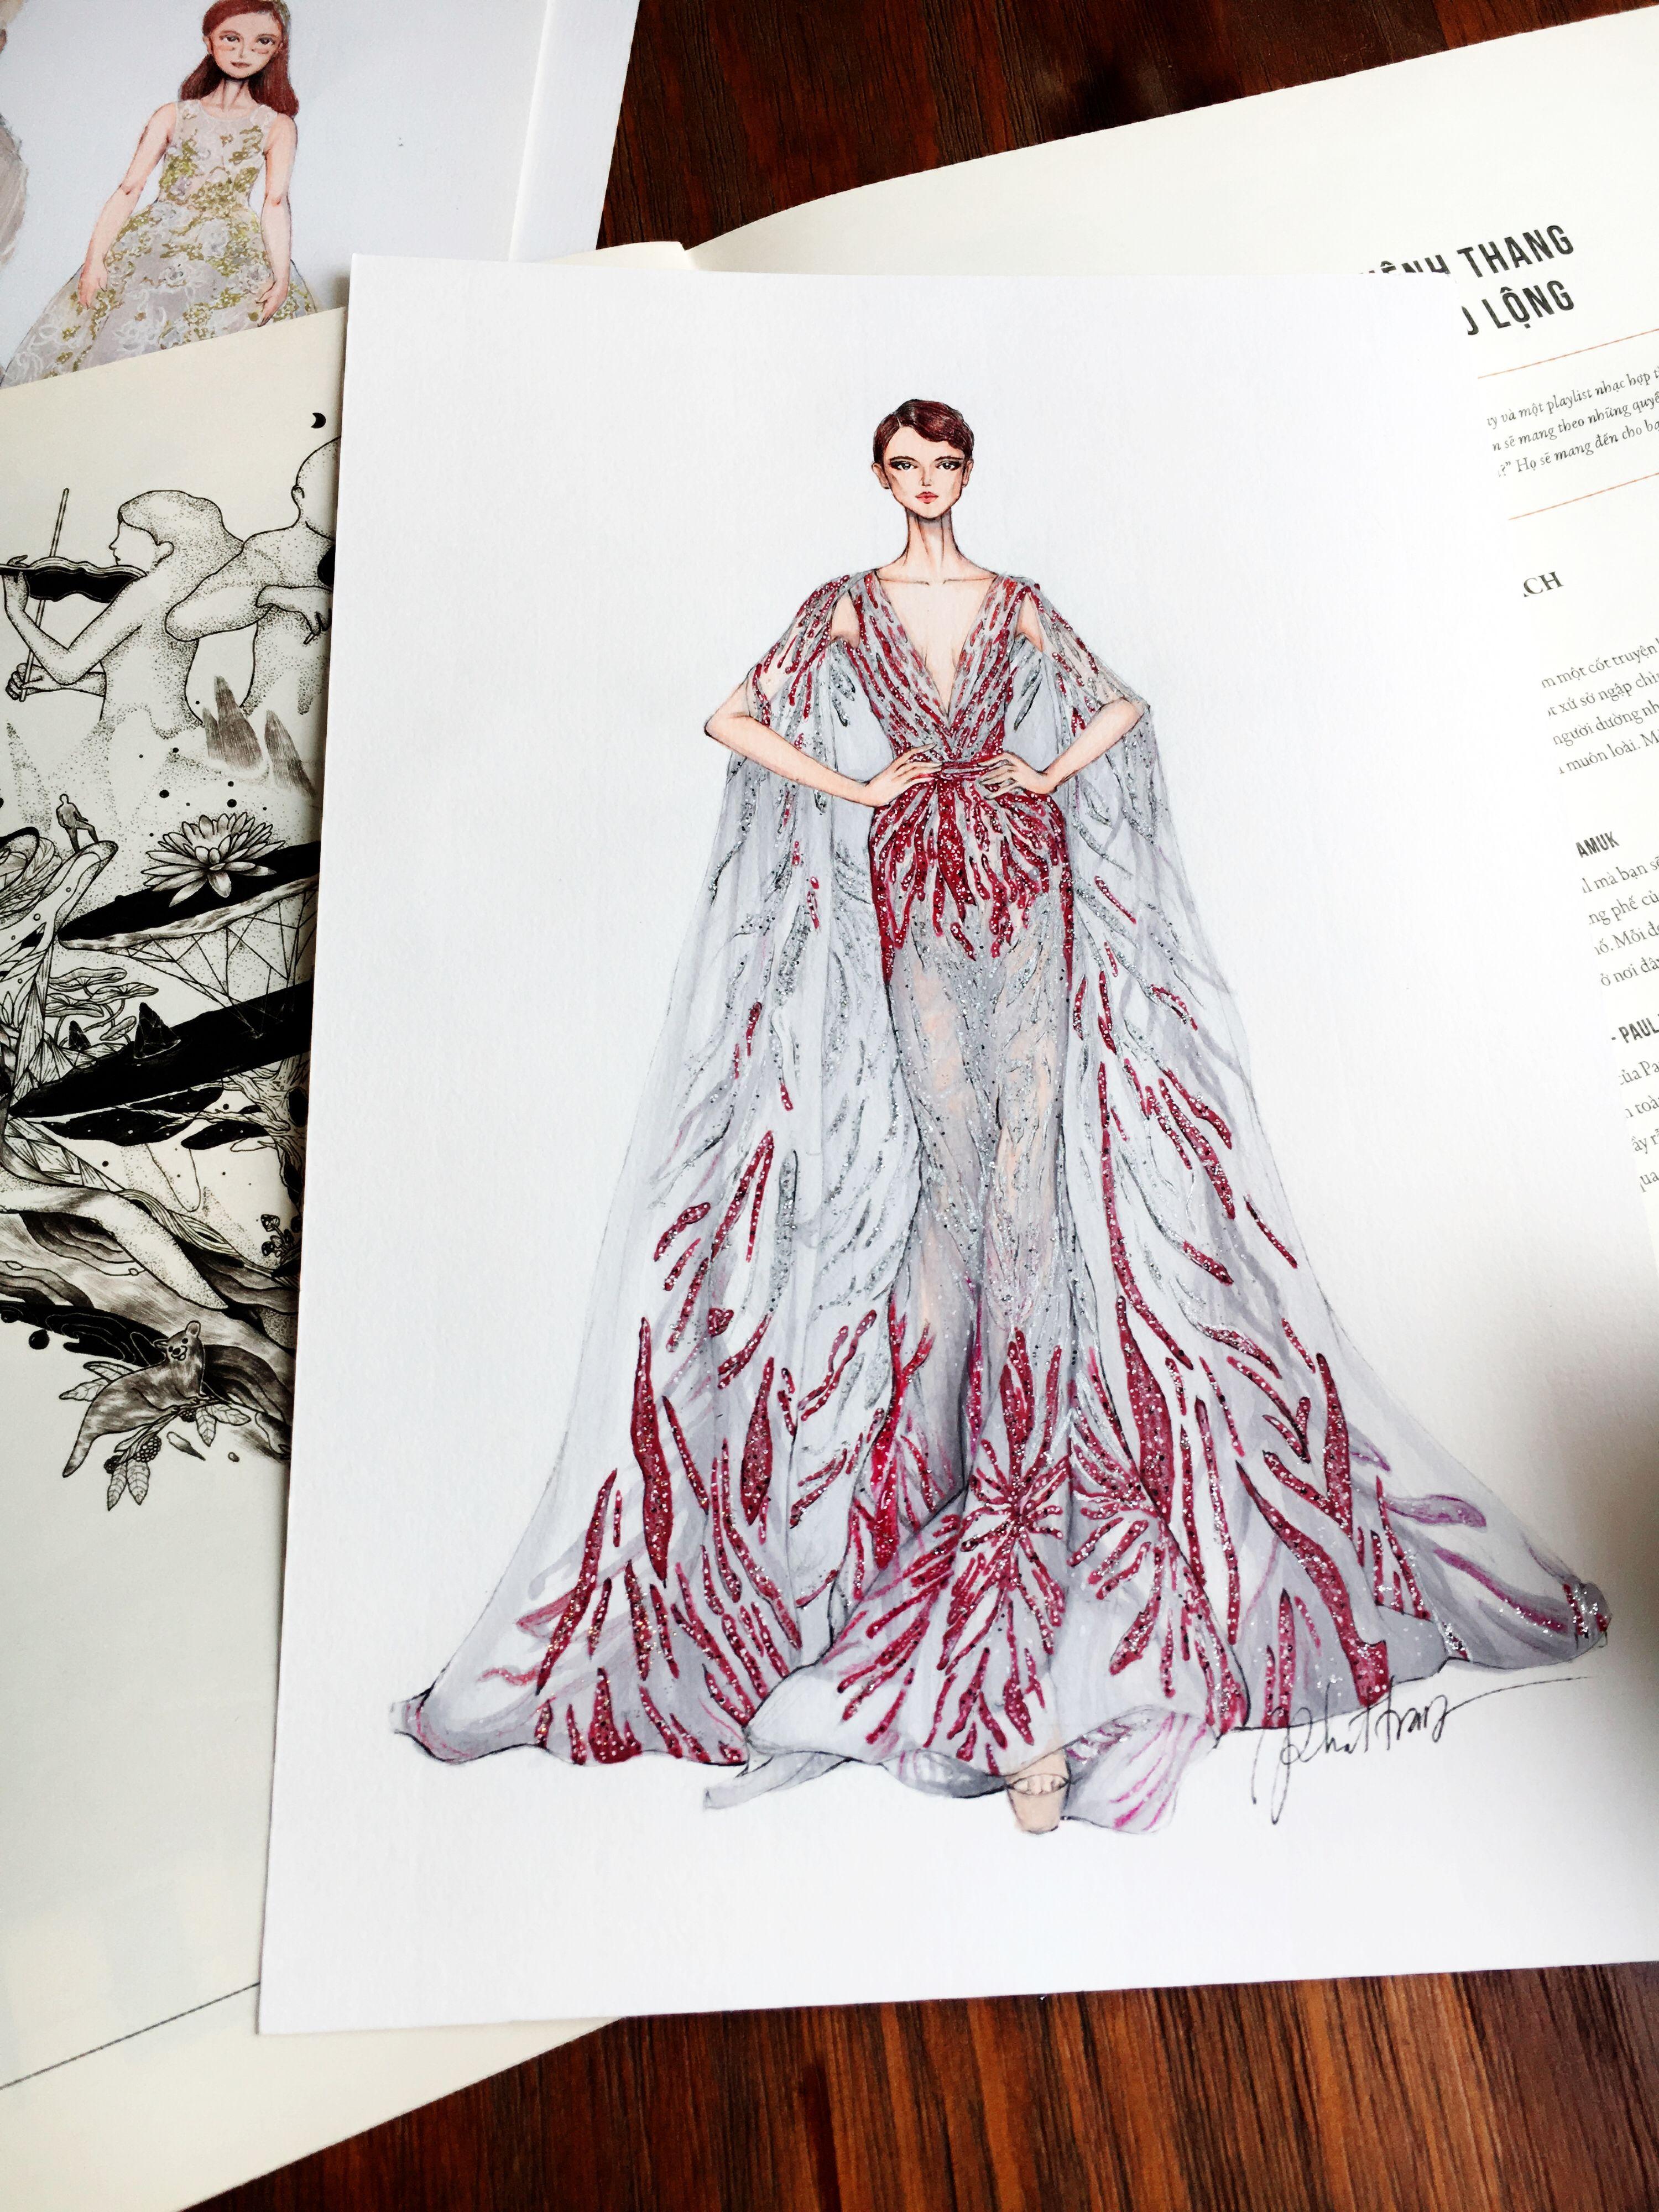 pinterest//dalvacheney | Fashion | Fashion design drawings ...